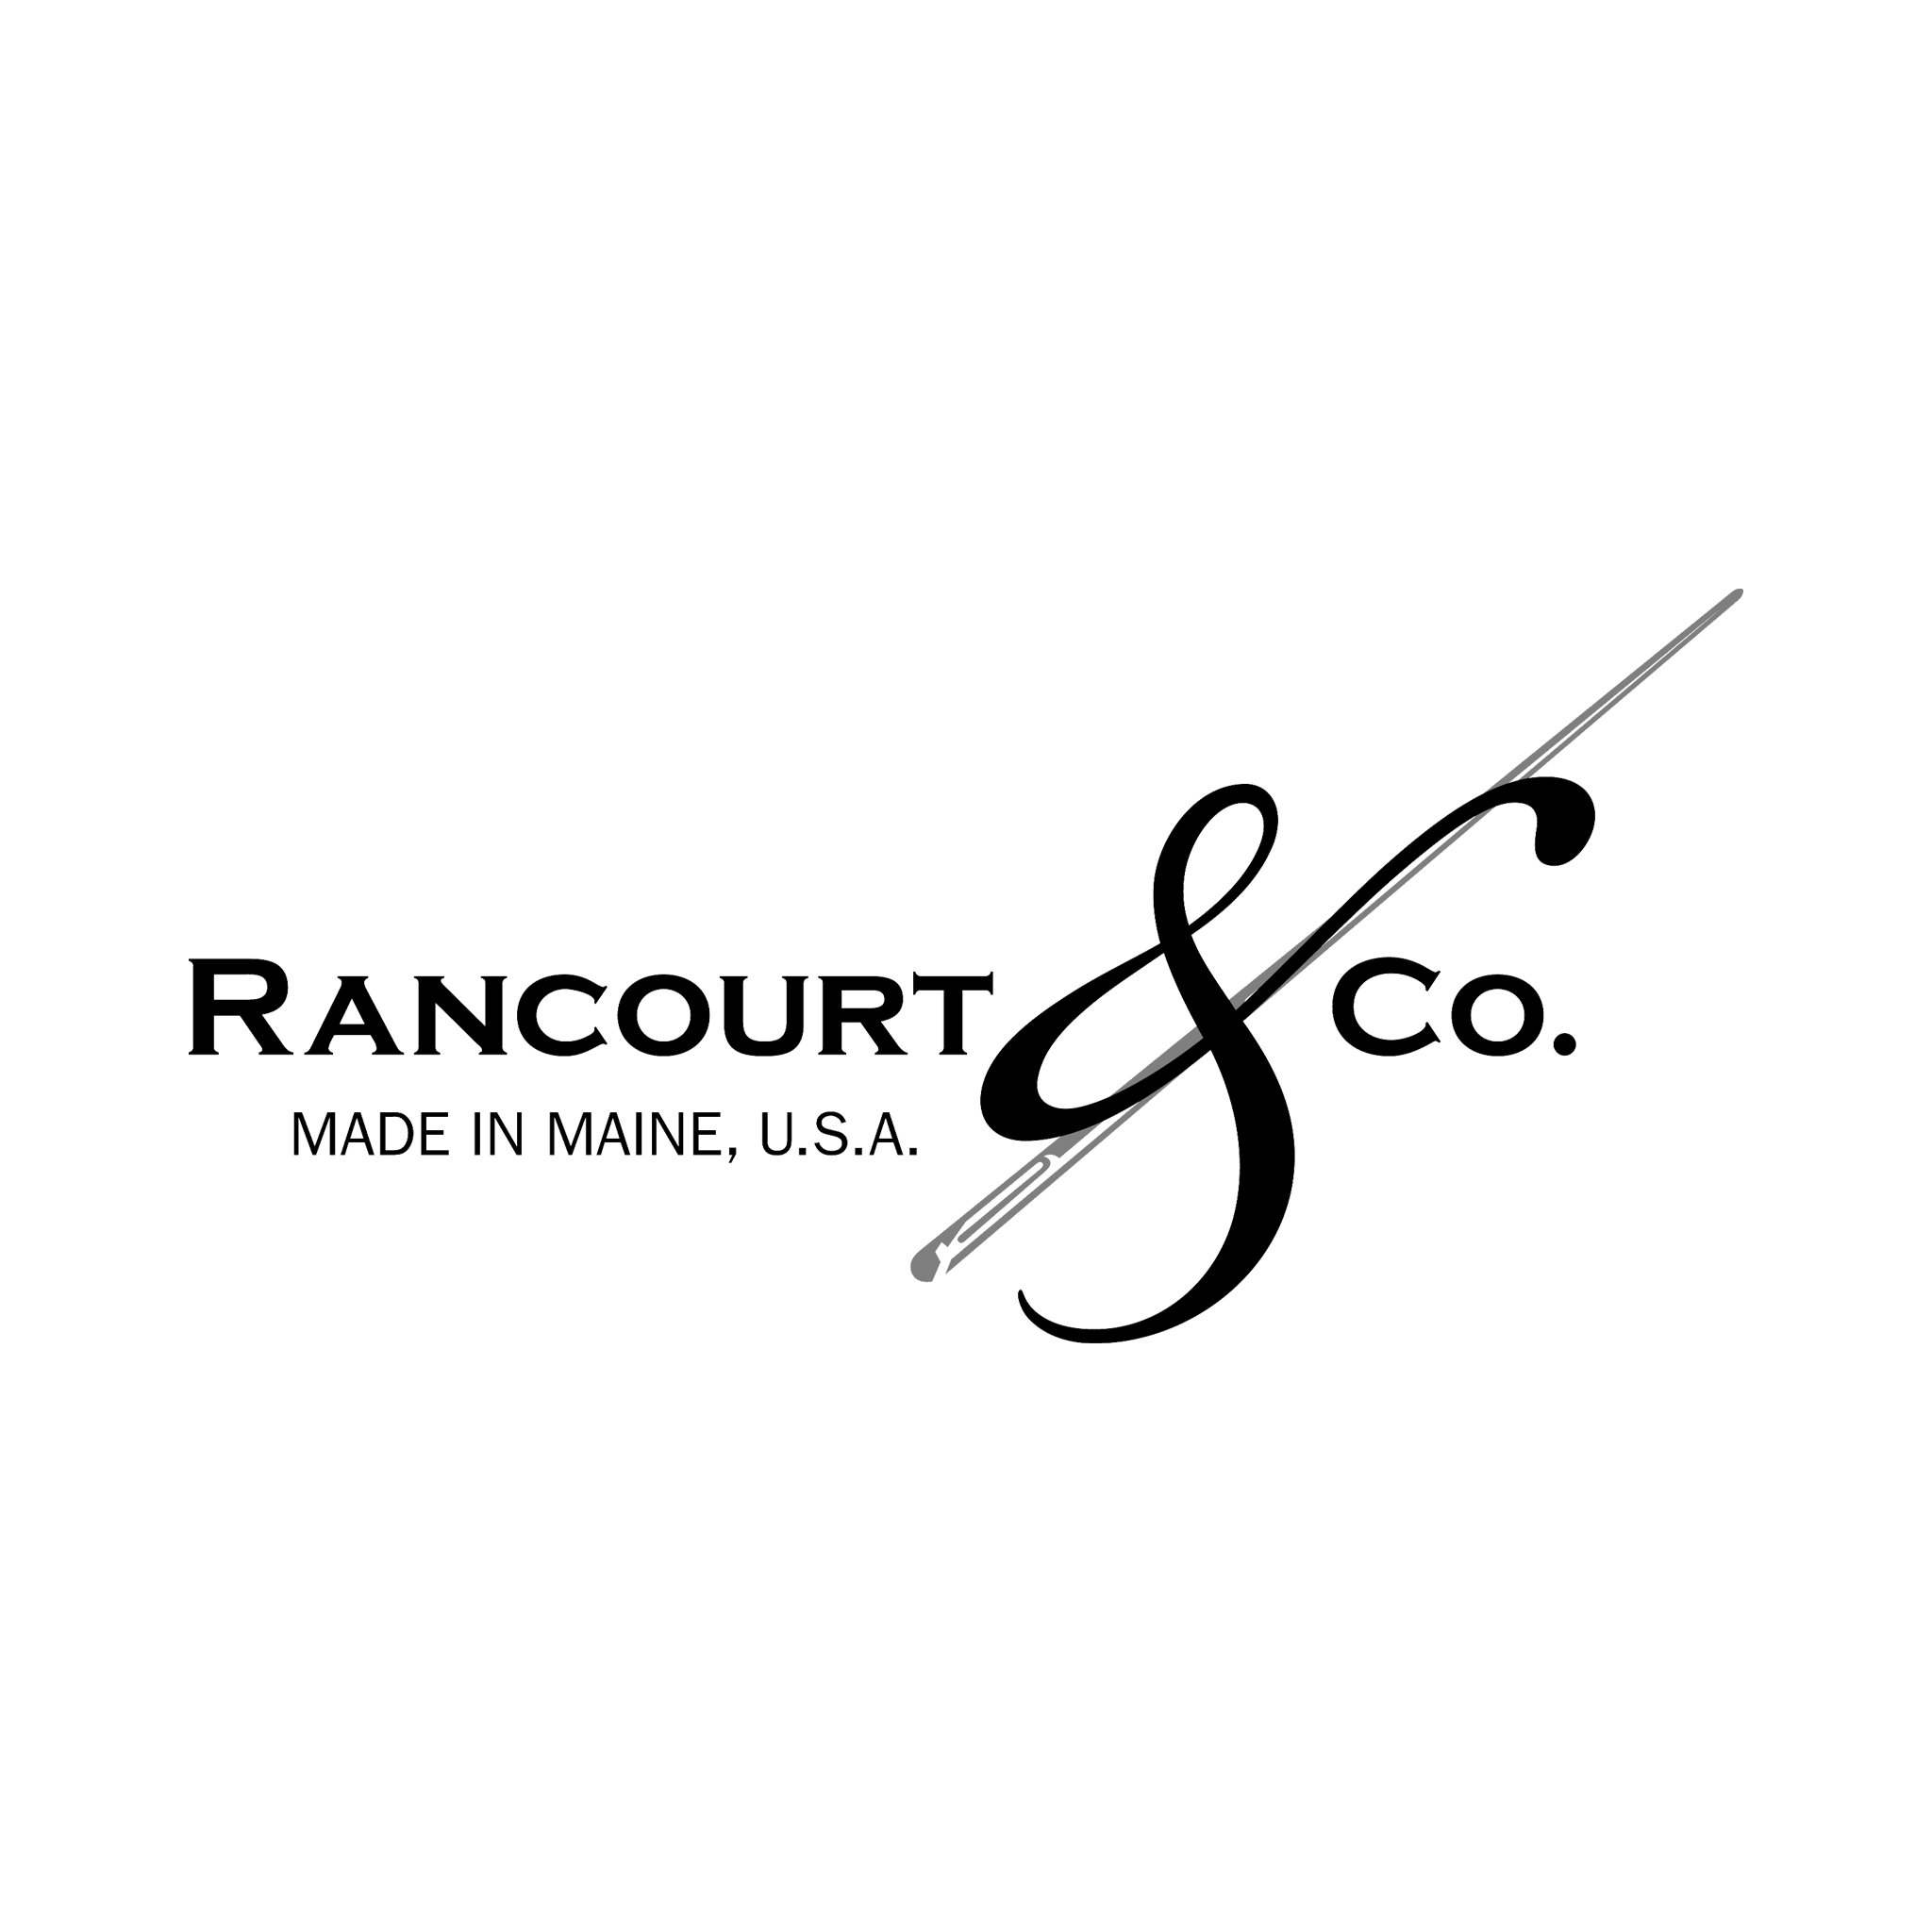 Rancourt & Co. logo